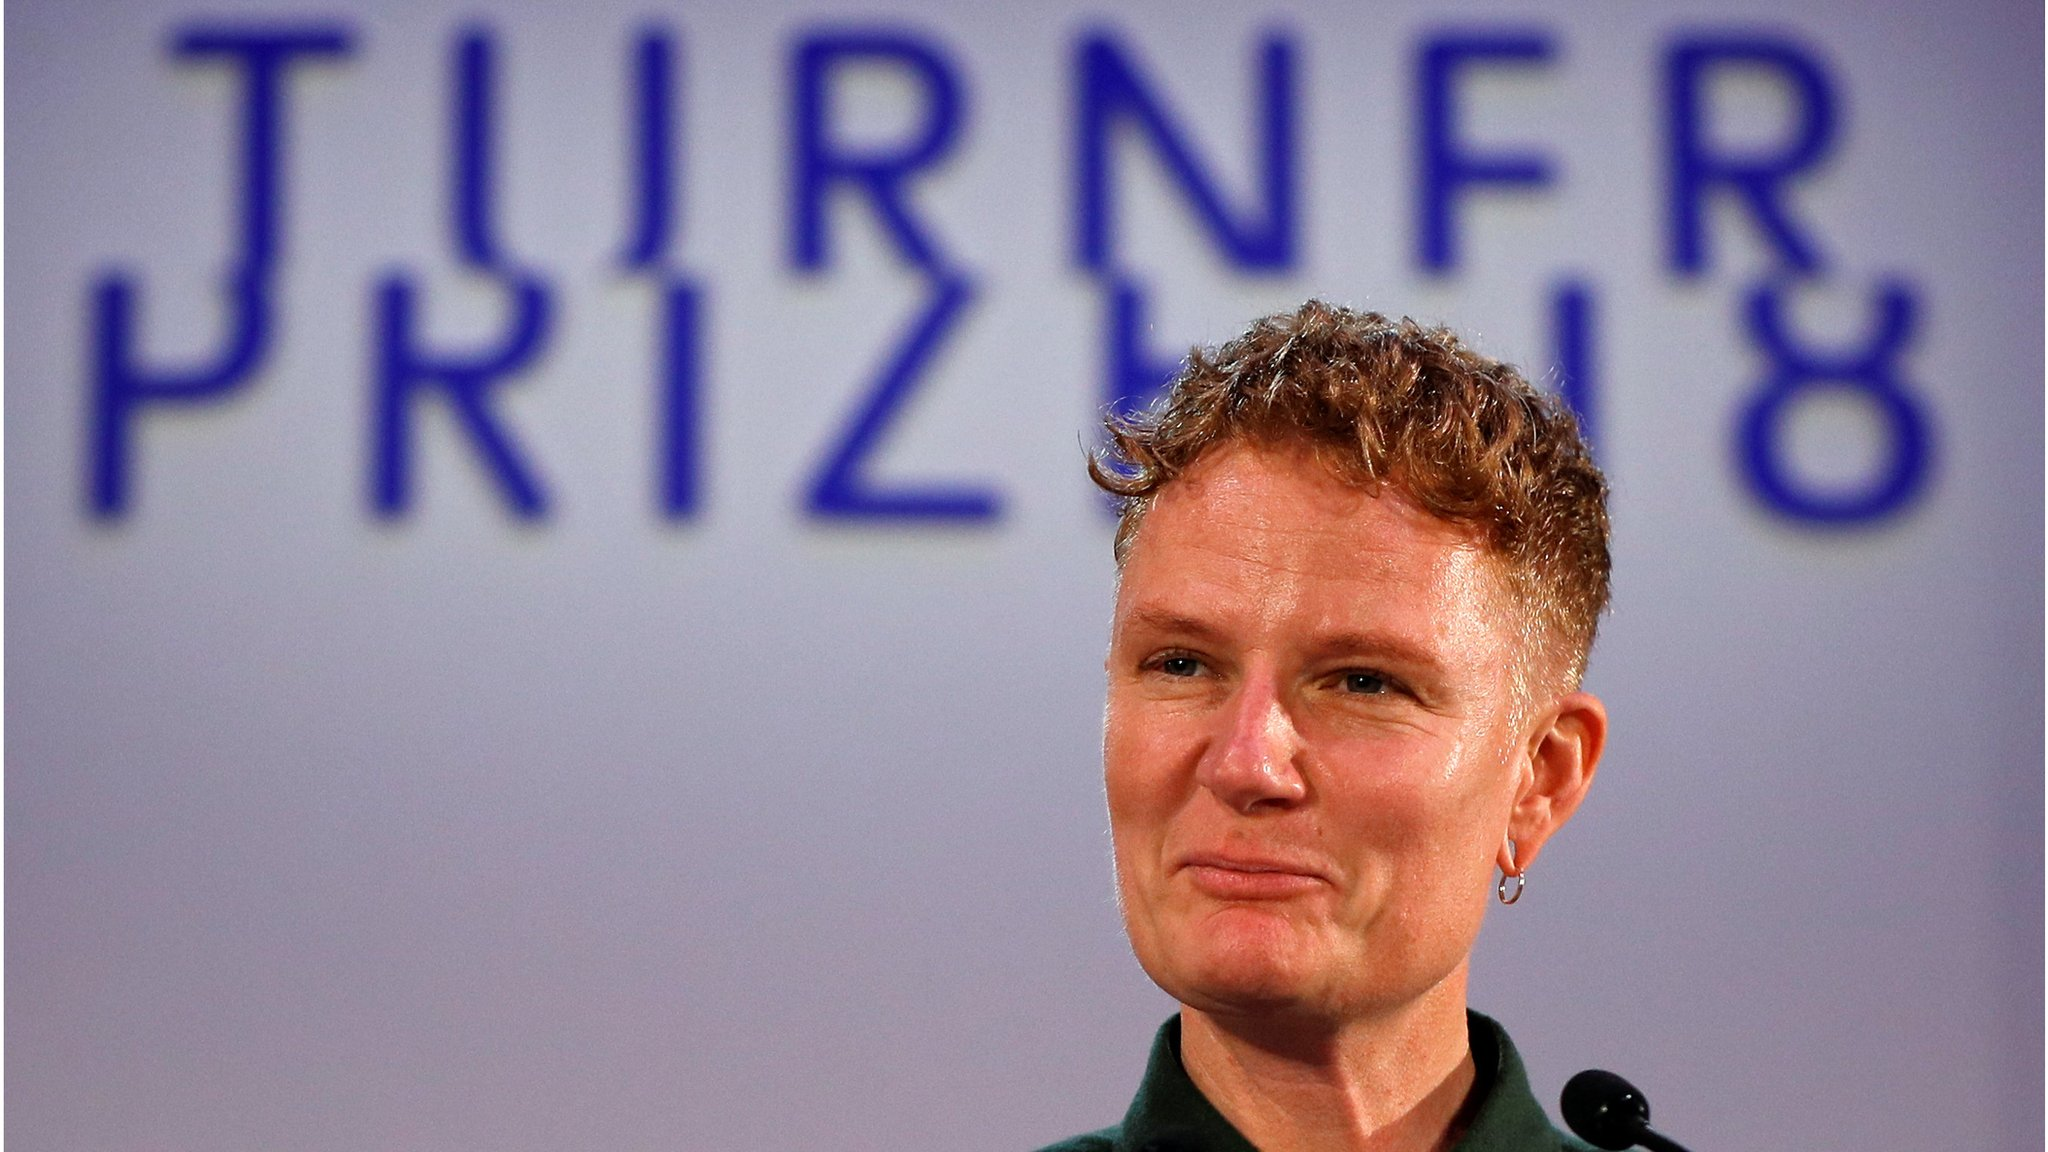 Turner Prize 2018: iPhone artist Charlotte Prodger wins